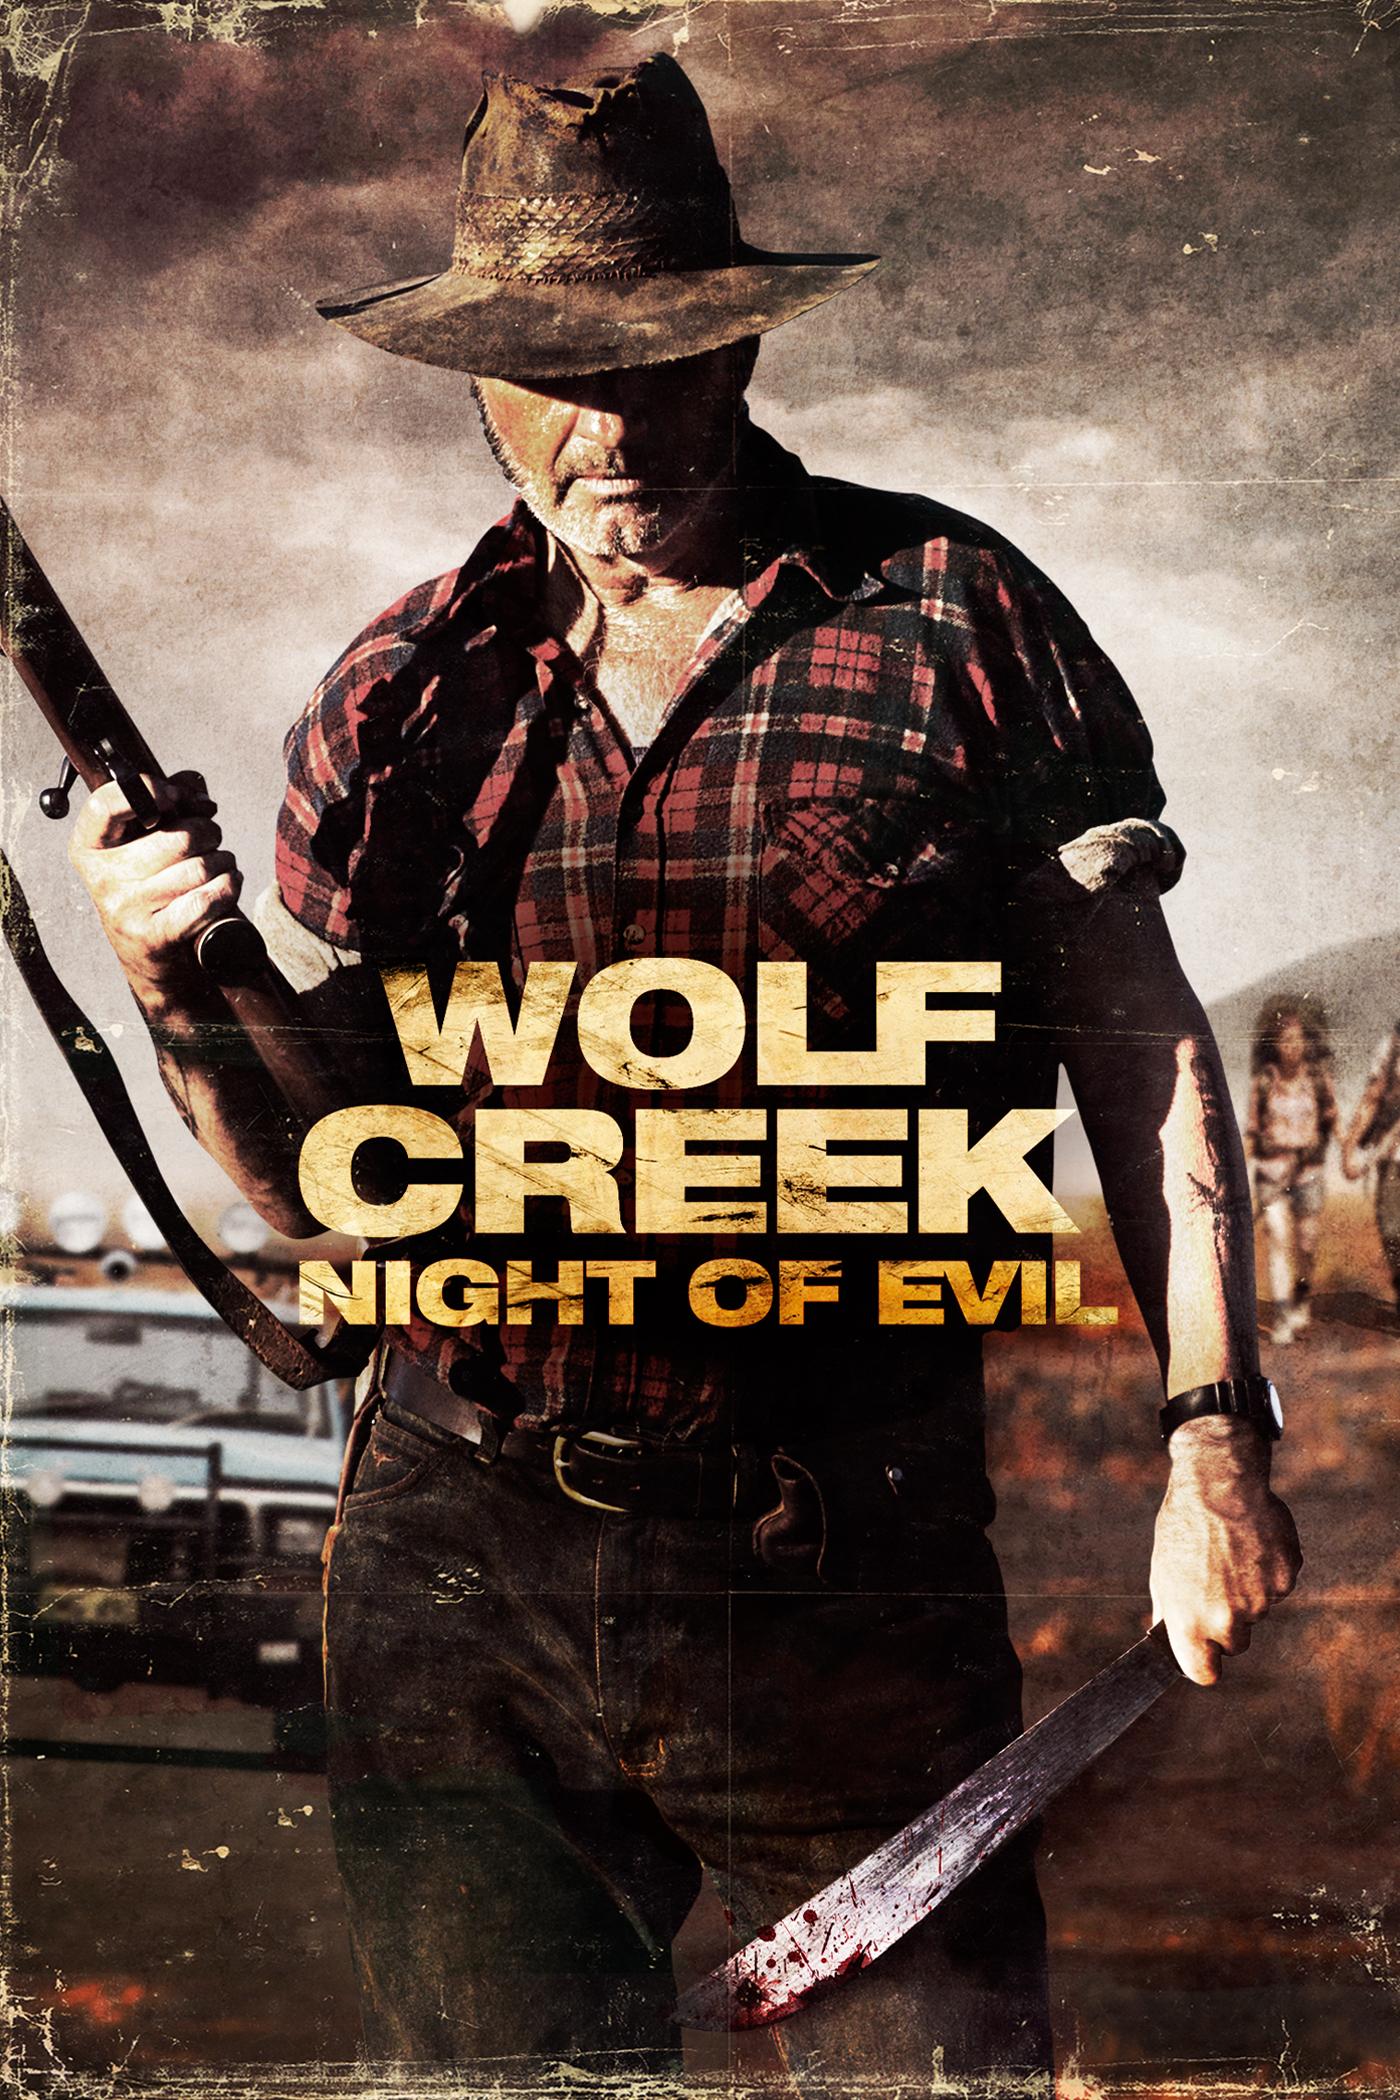 Wolf Creek: Night of Evil